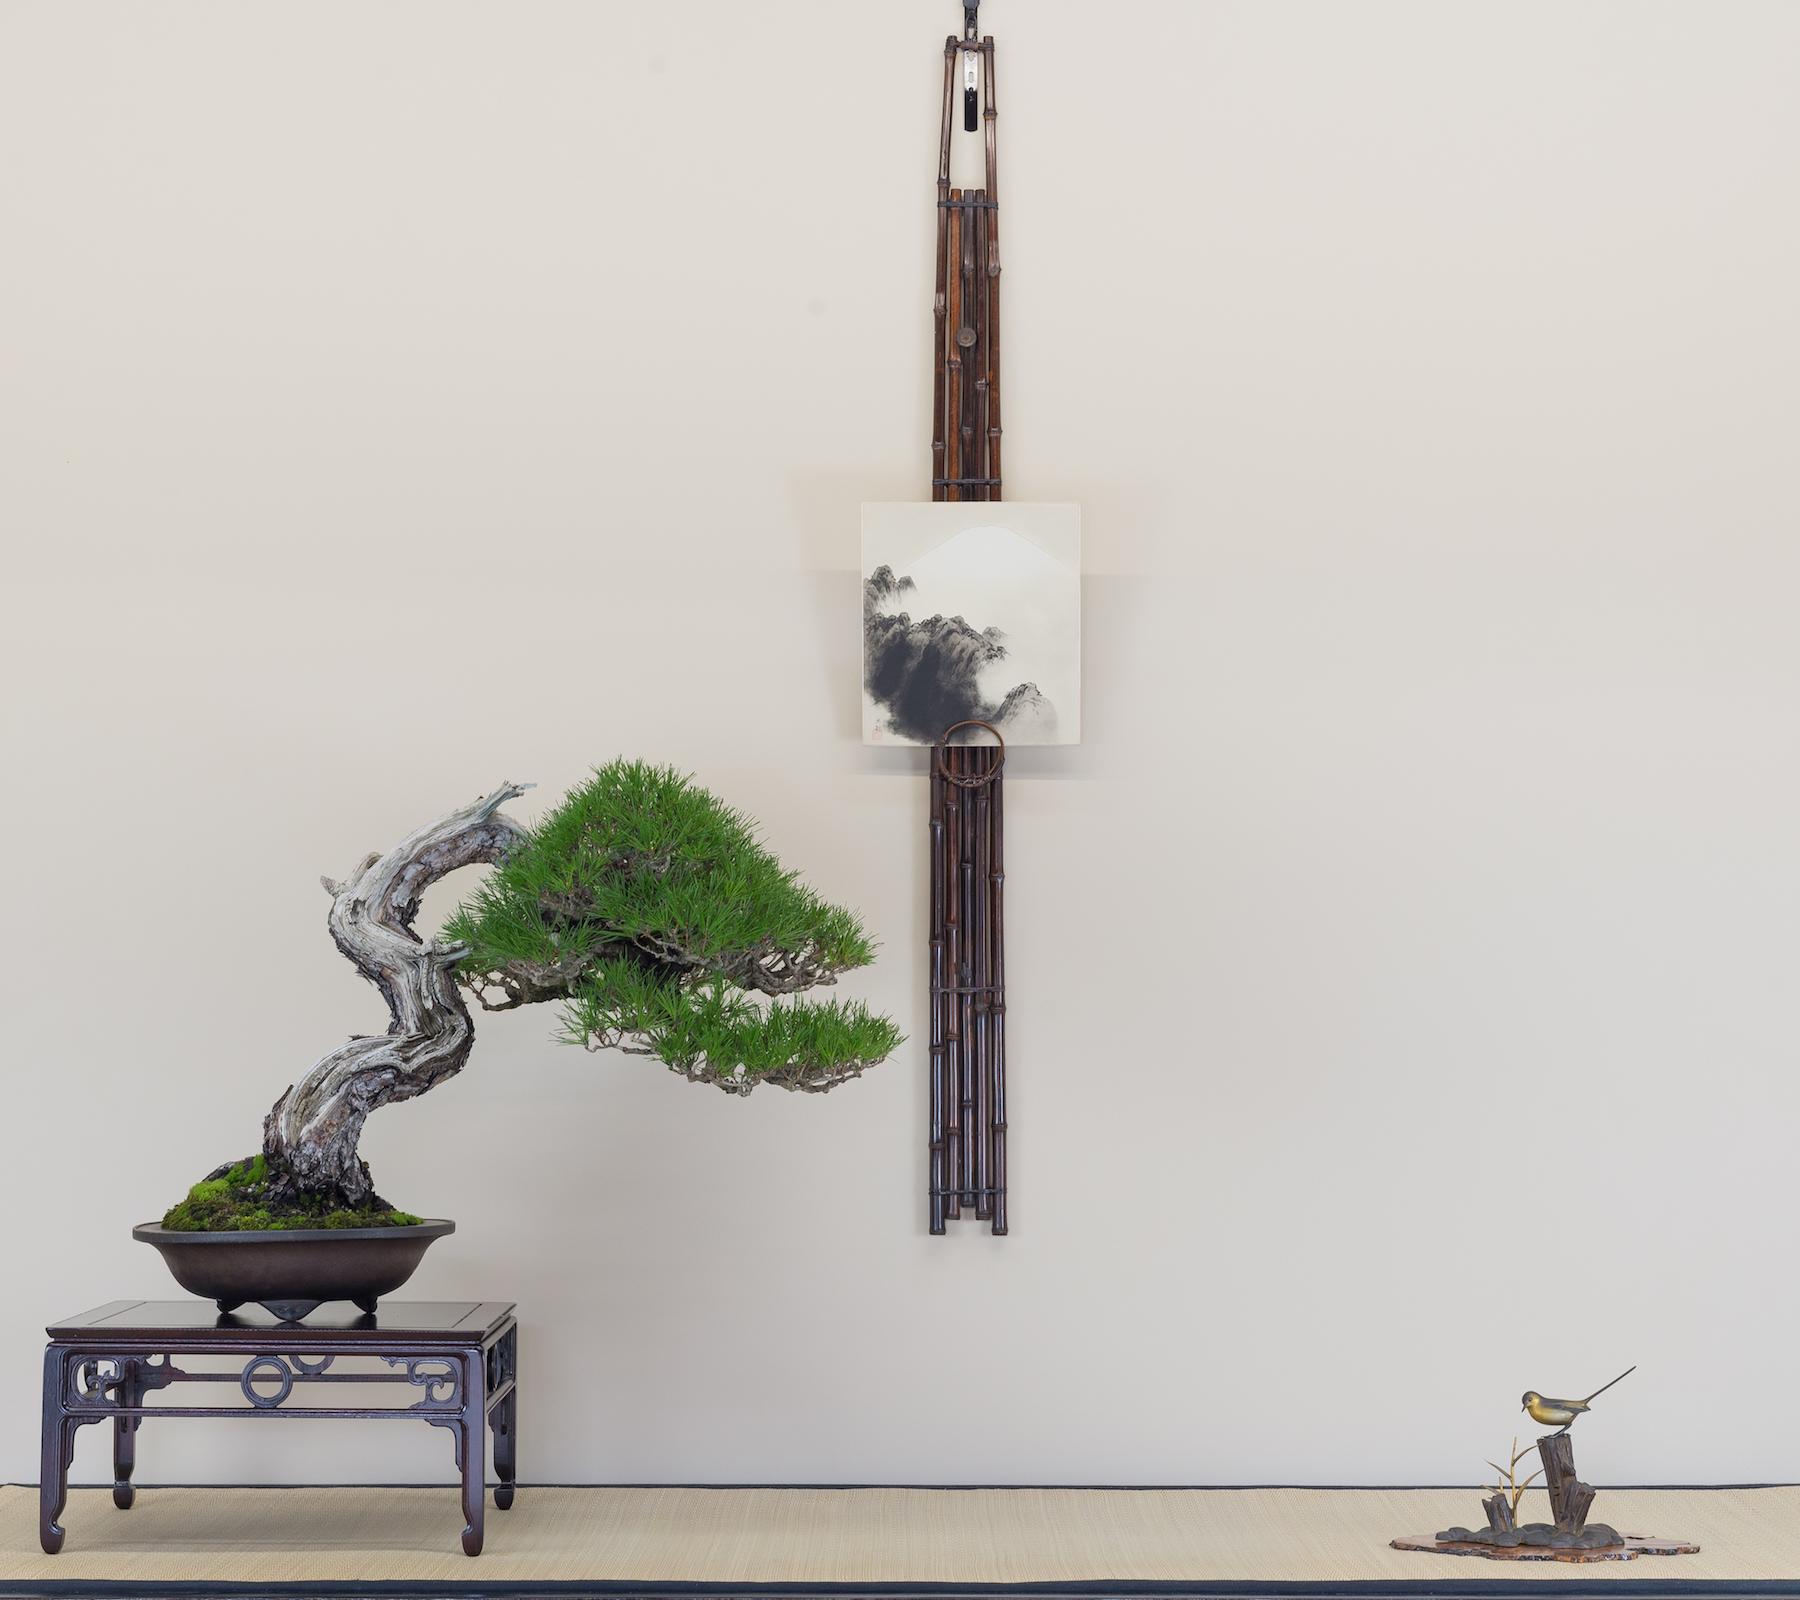 Composición de bonsai de invierno, pino rojo japonés